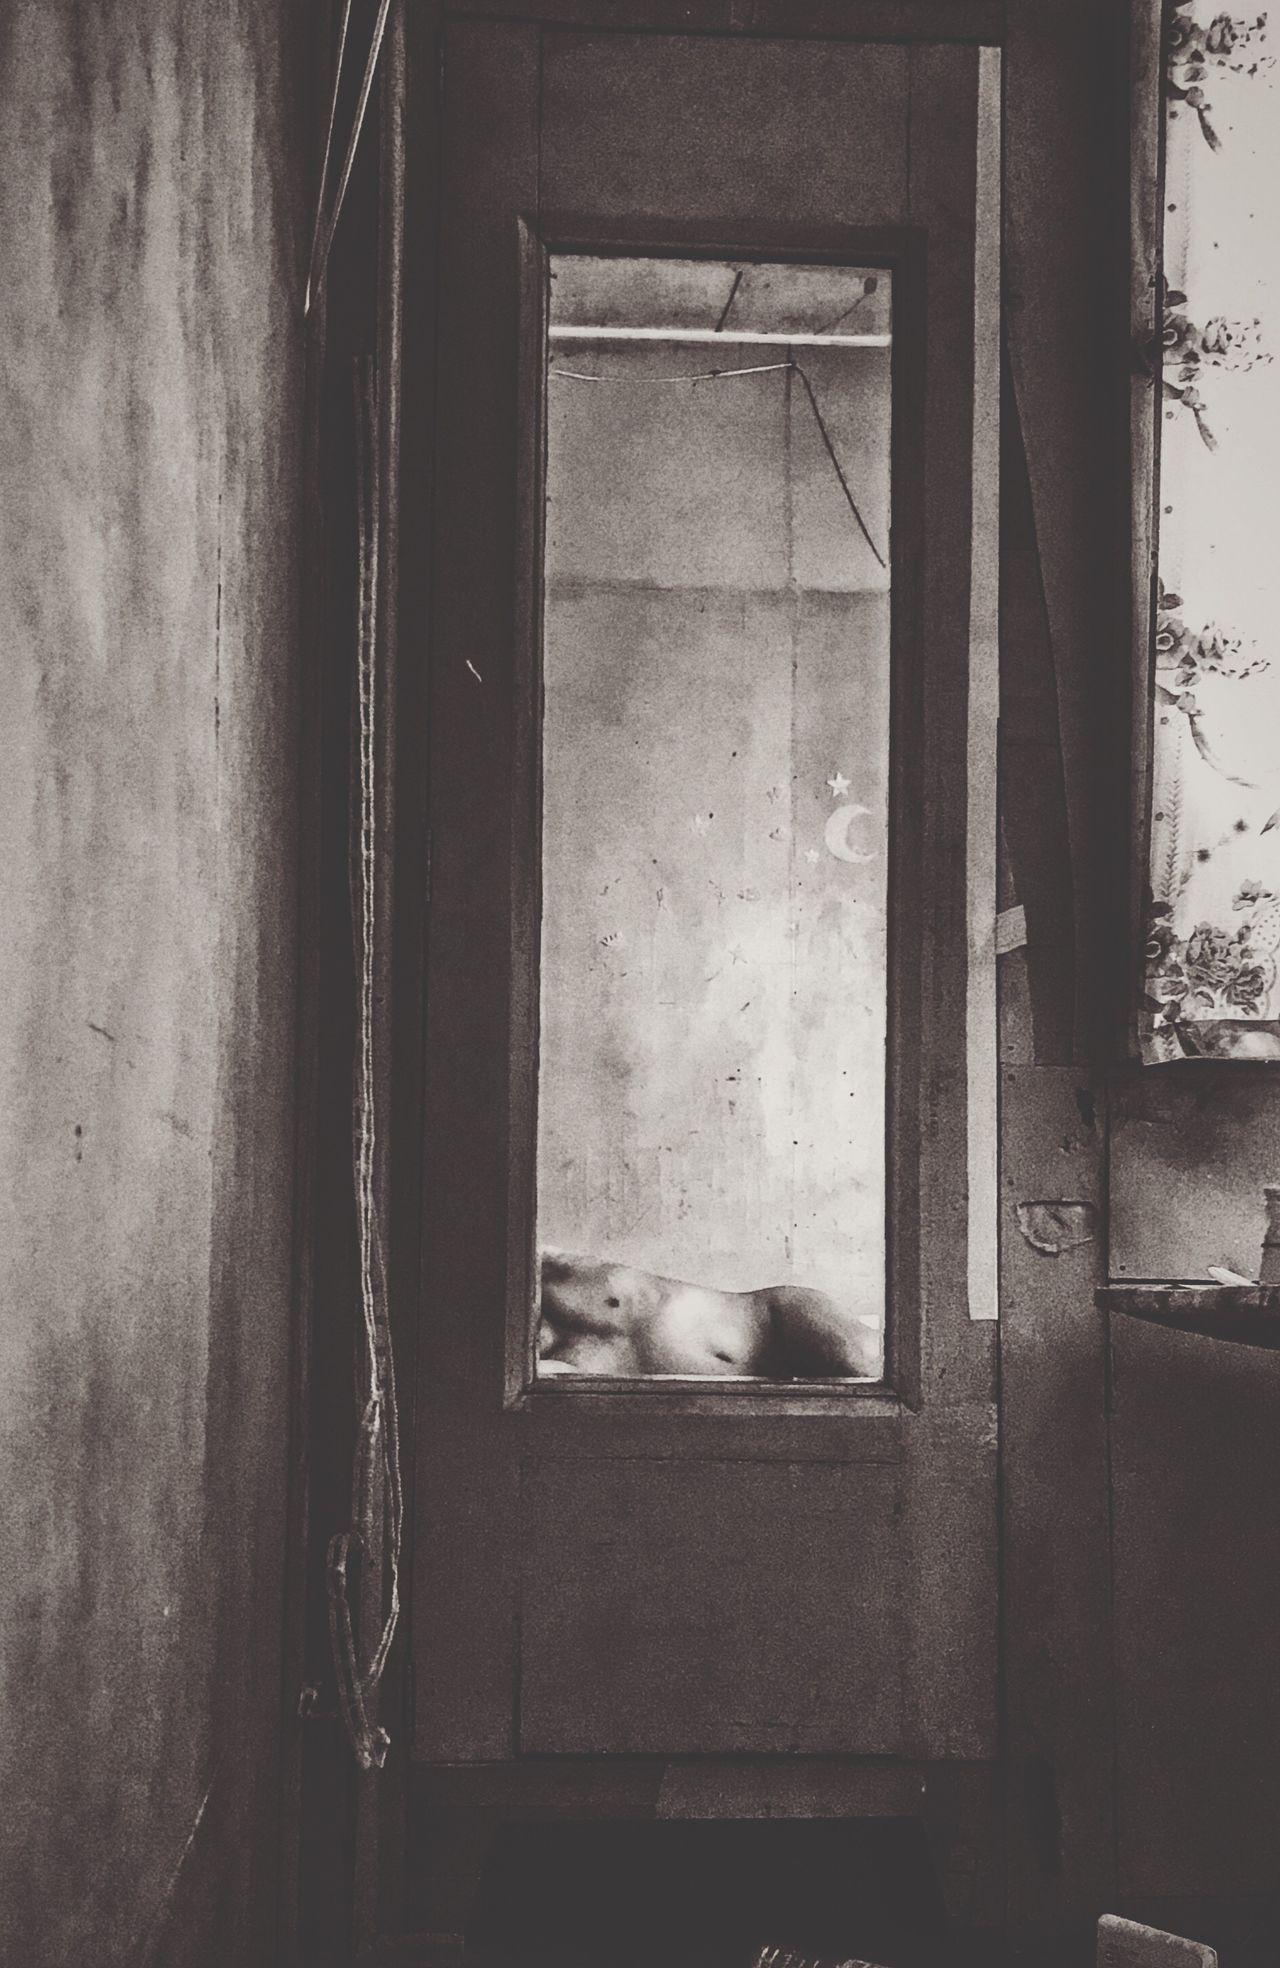 Mirror Reflection Mirror Image Indoors  Room Sad & Lonely Nakedhuman Noclothestoday Secrets Mirror Picture Eye4photography  EyeEm EyeEm Best Shots - Black + White